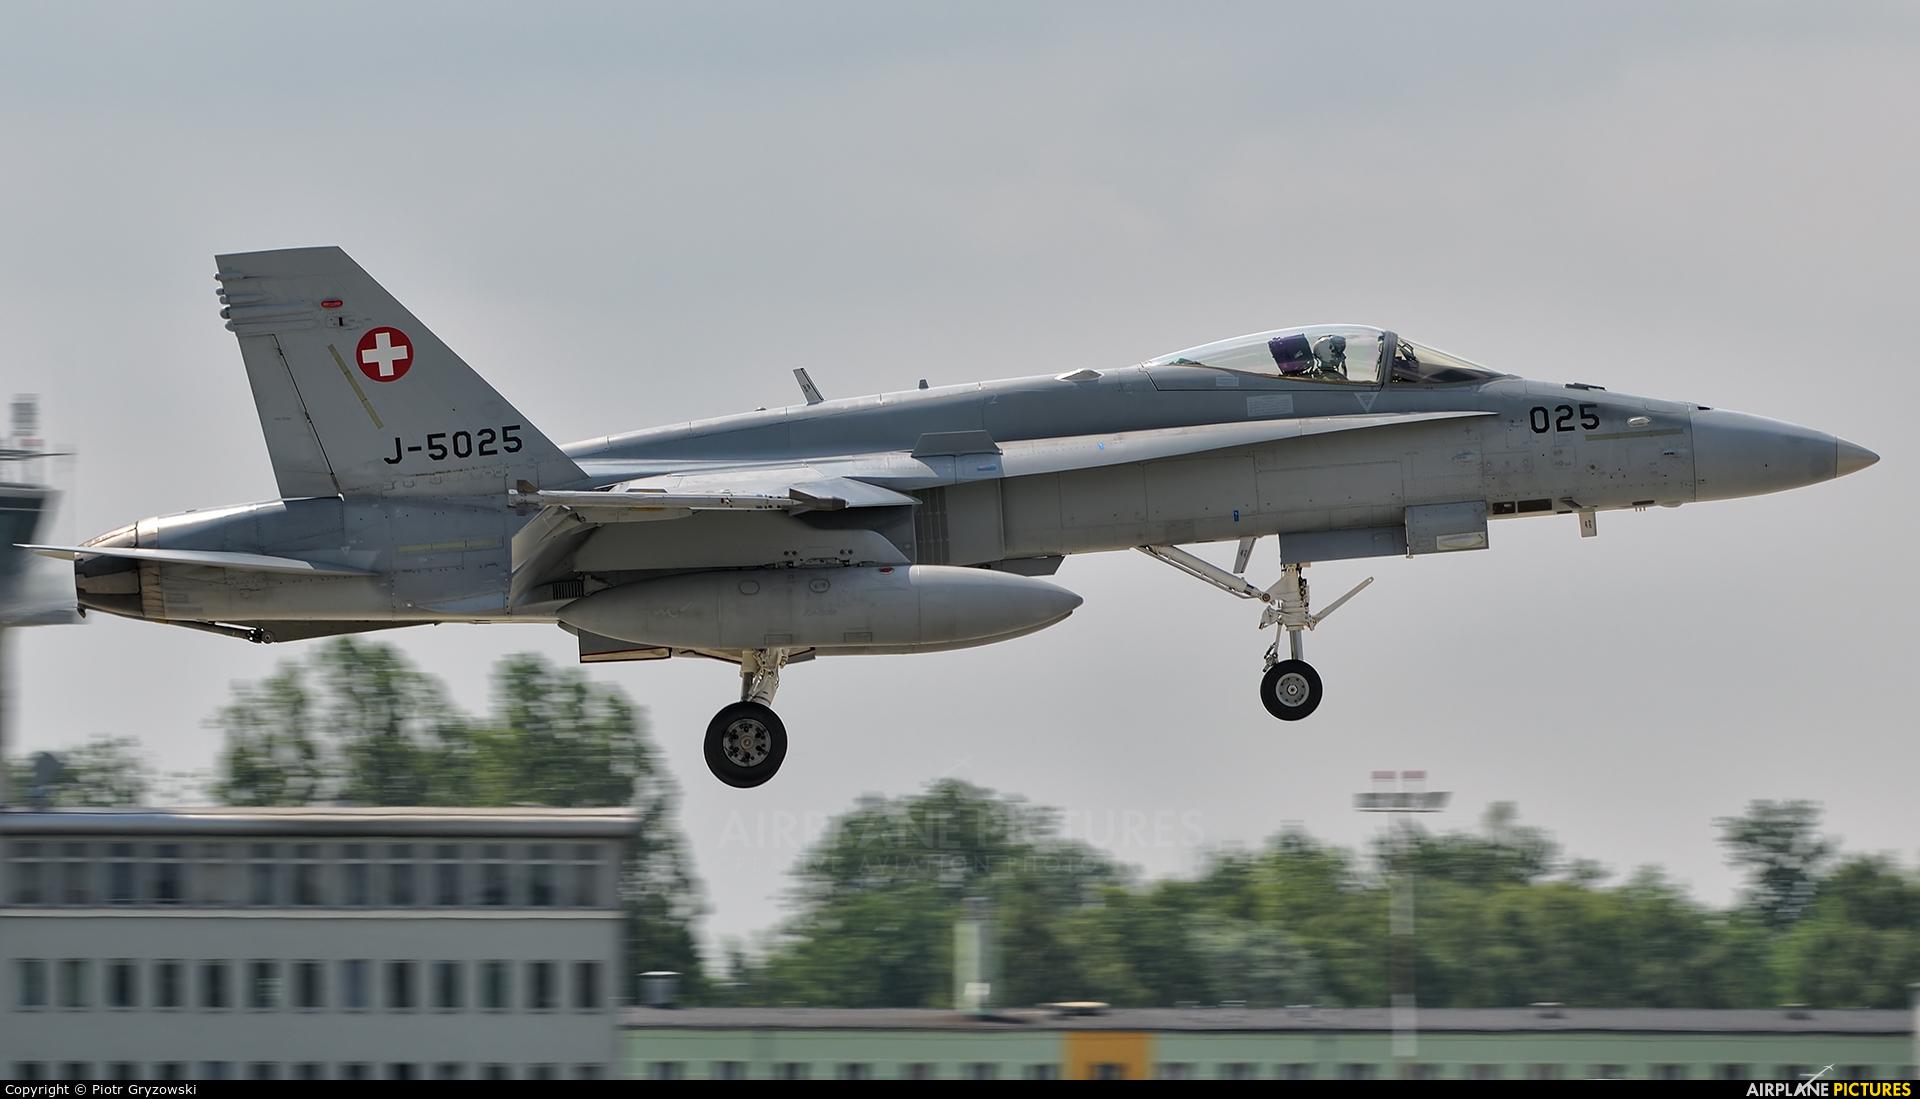 Switzerland - Air Force J-5025 aircraft at Poznań - Krzesiny